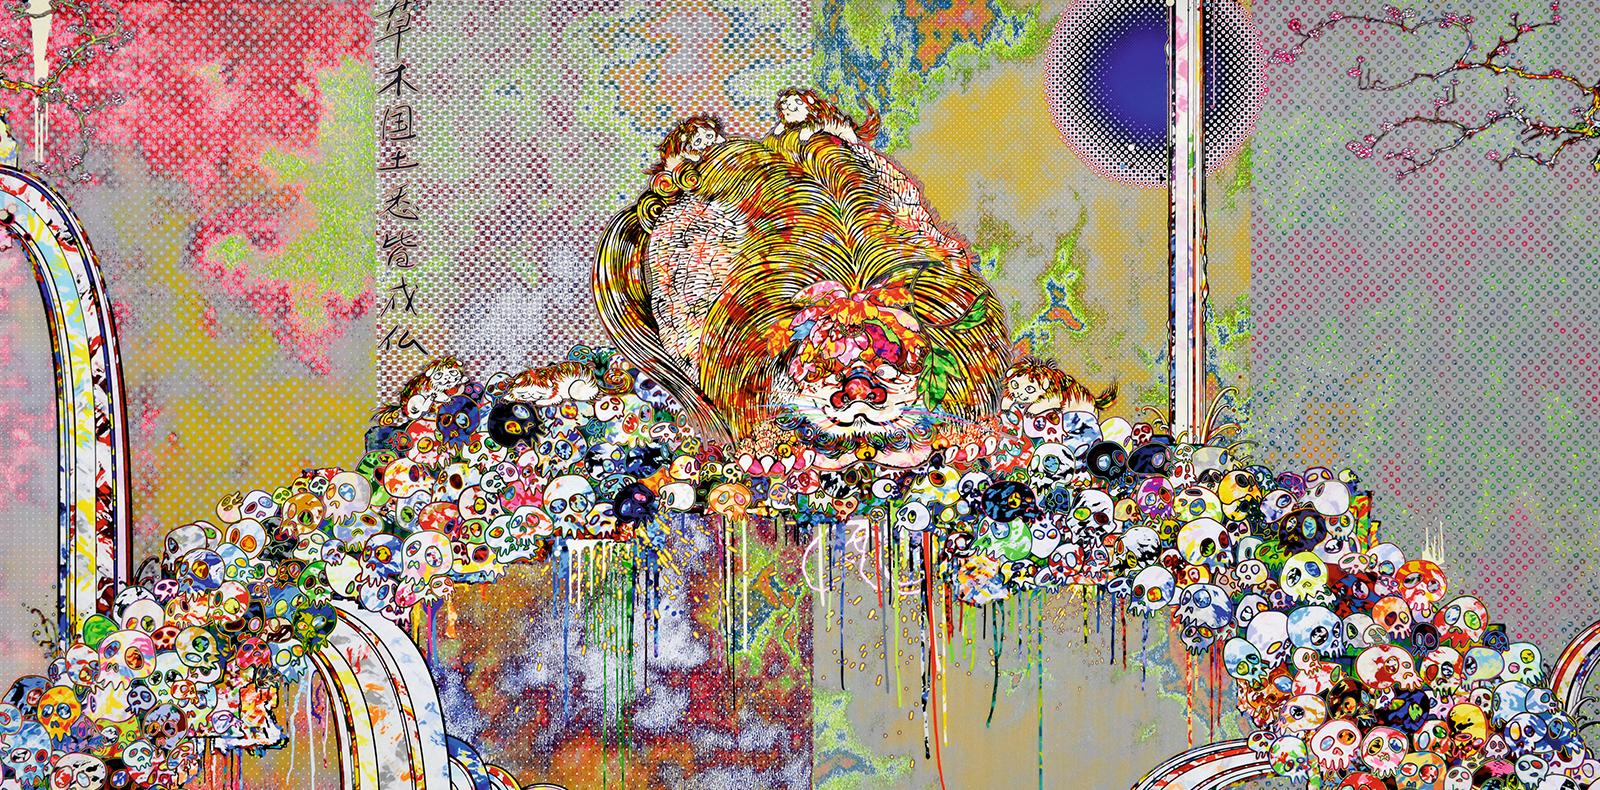 Takashi Murakami, Title TBD, 2018 Acrylic on canvas mounted on aluminium frame, 59 1/16 x 118 1/8 inches, (150 x 300 cm) Gagosian